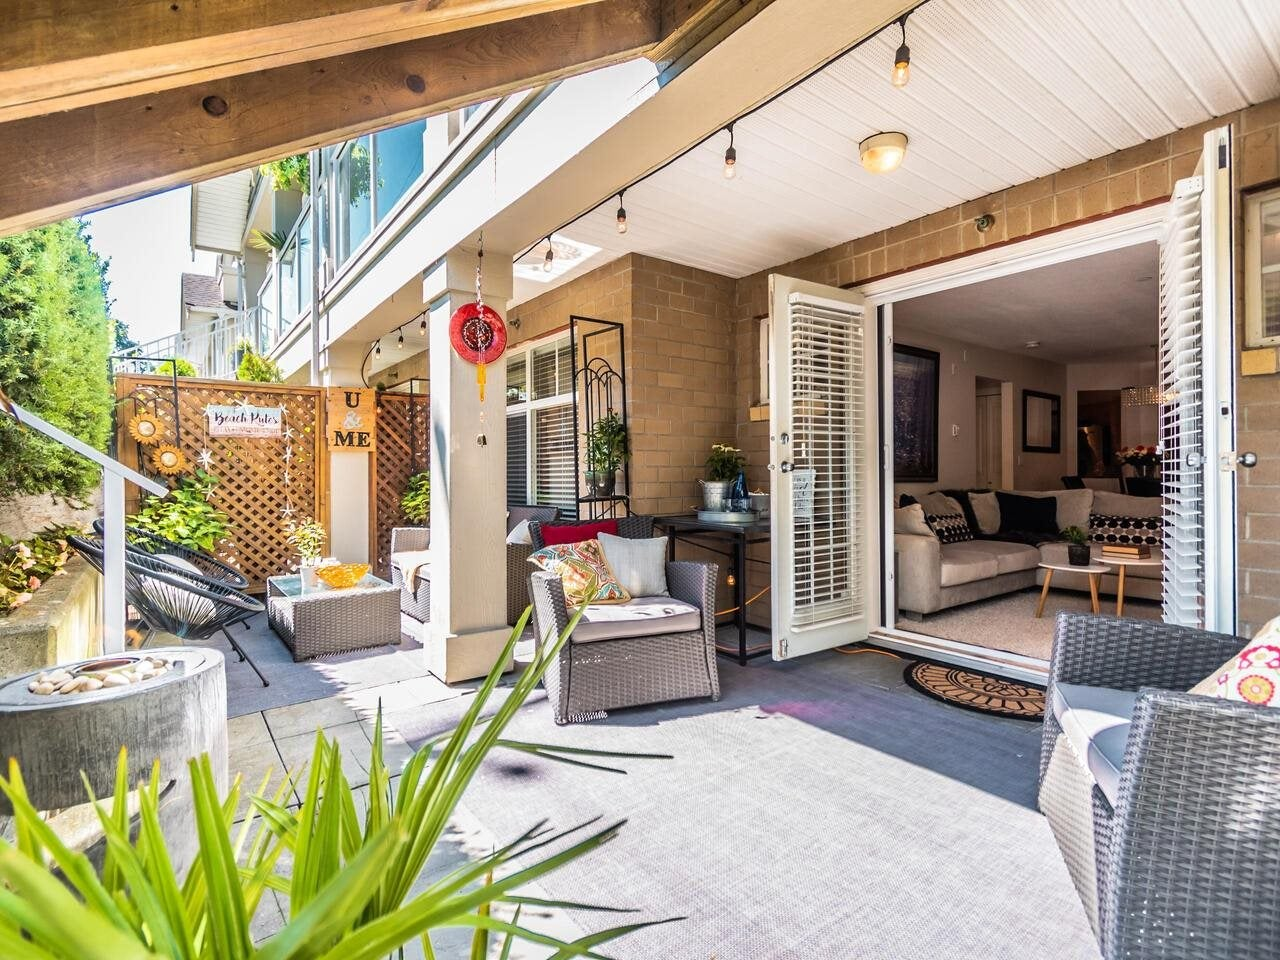 102 15621 MARINE DRIVE - White Rock Apartment/Condo for sale, 2 Bedrooms (R2603129) - #1